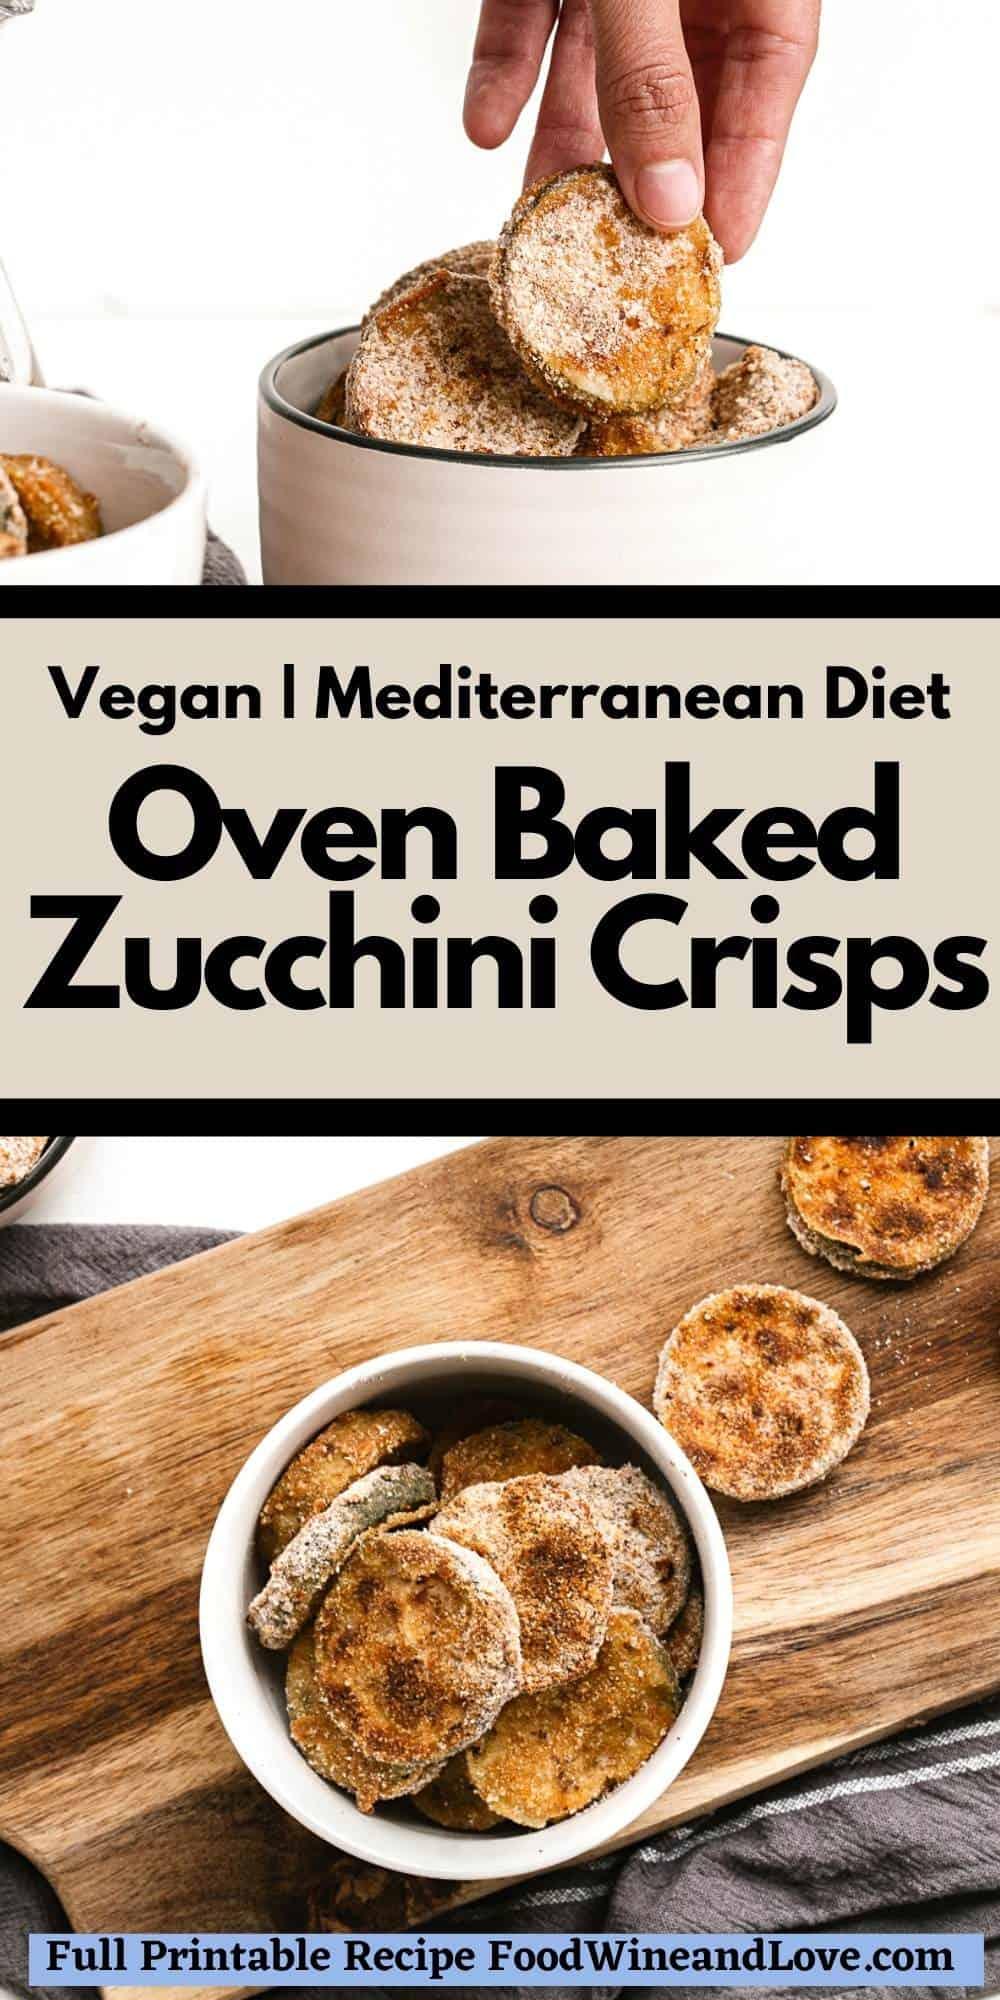 Oven Baked Zucchini Crisps